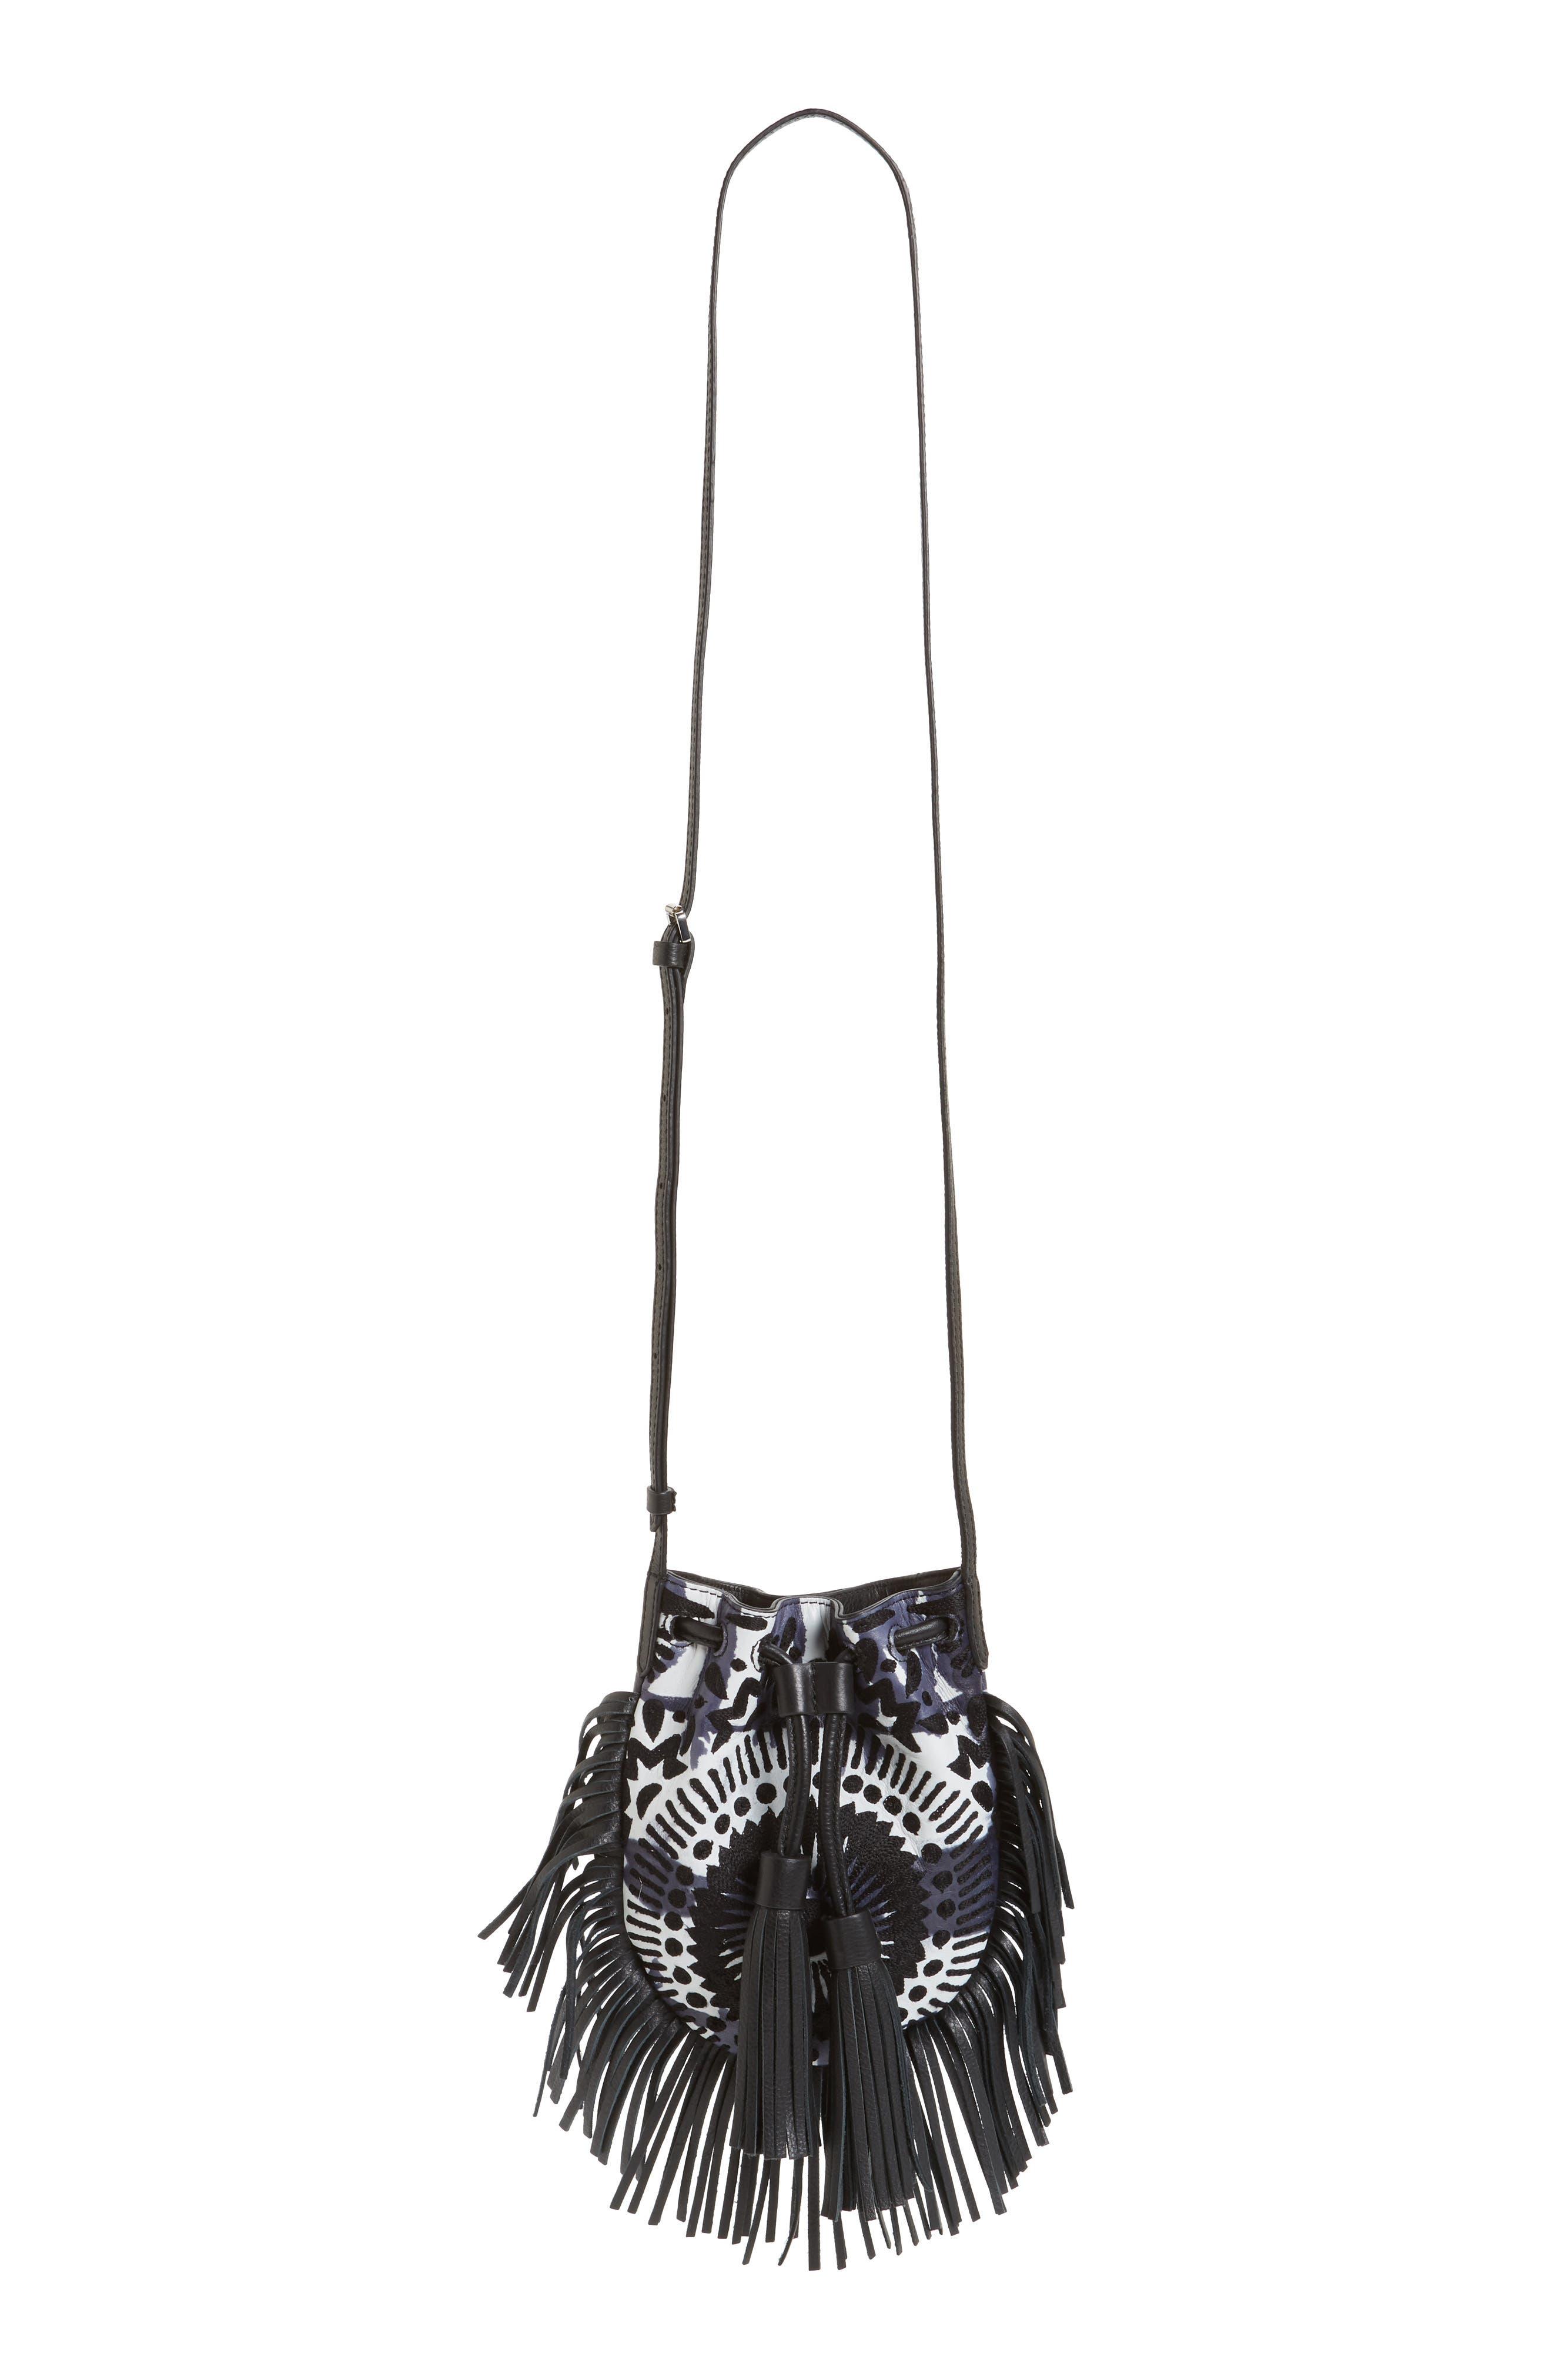 Alternate Image 1 Selected - Rebecca Minkoff Revel Phone Crossbody Bag